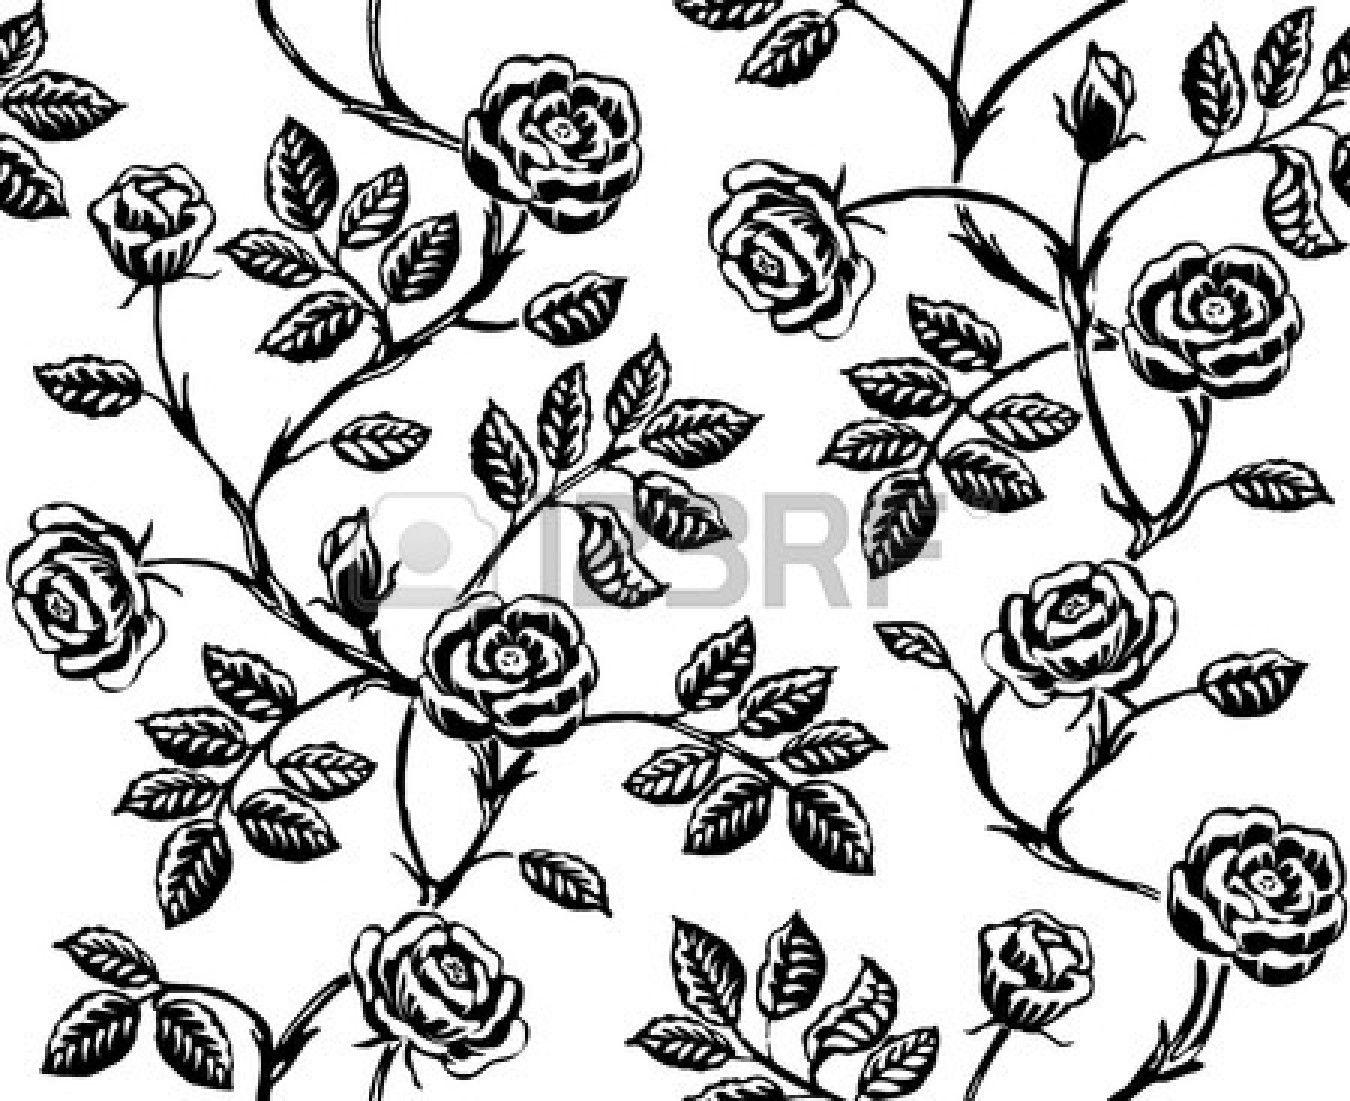 http://us.123rf.com/450wm/meganeura/meganeura1401/meganeura140100011/25312625-vintage-floral-seamless-pattern-classic-hand-drawn-roses.jpg